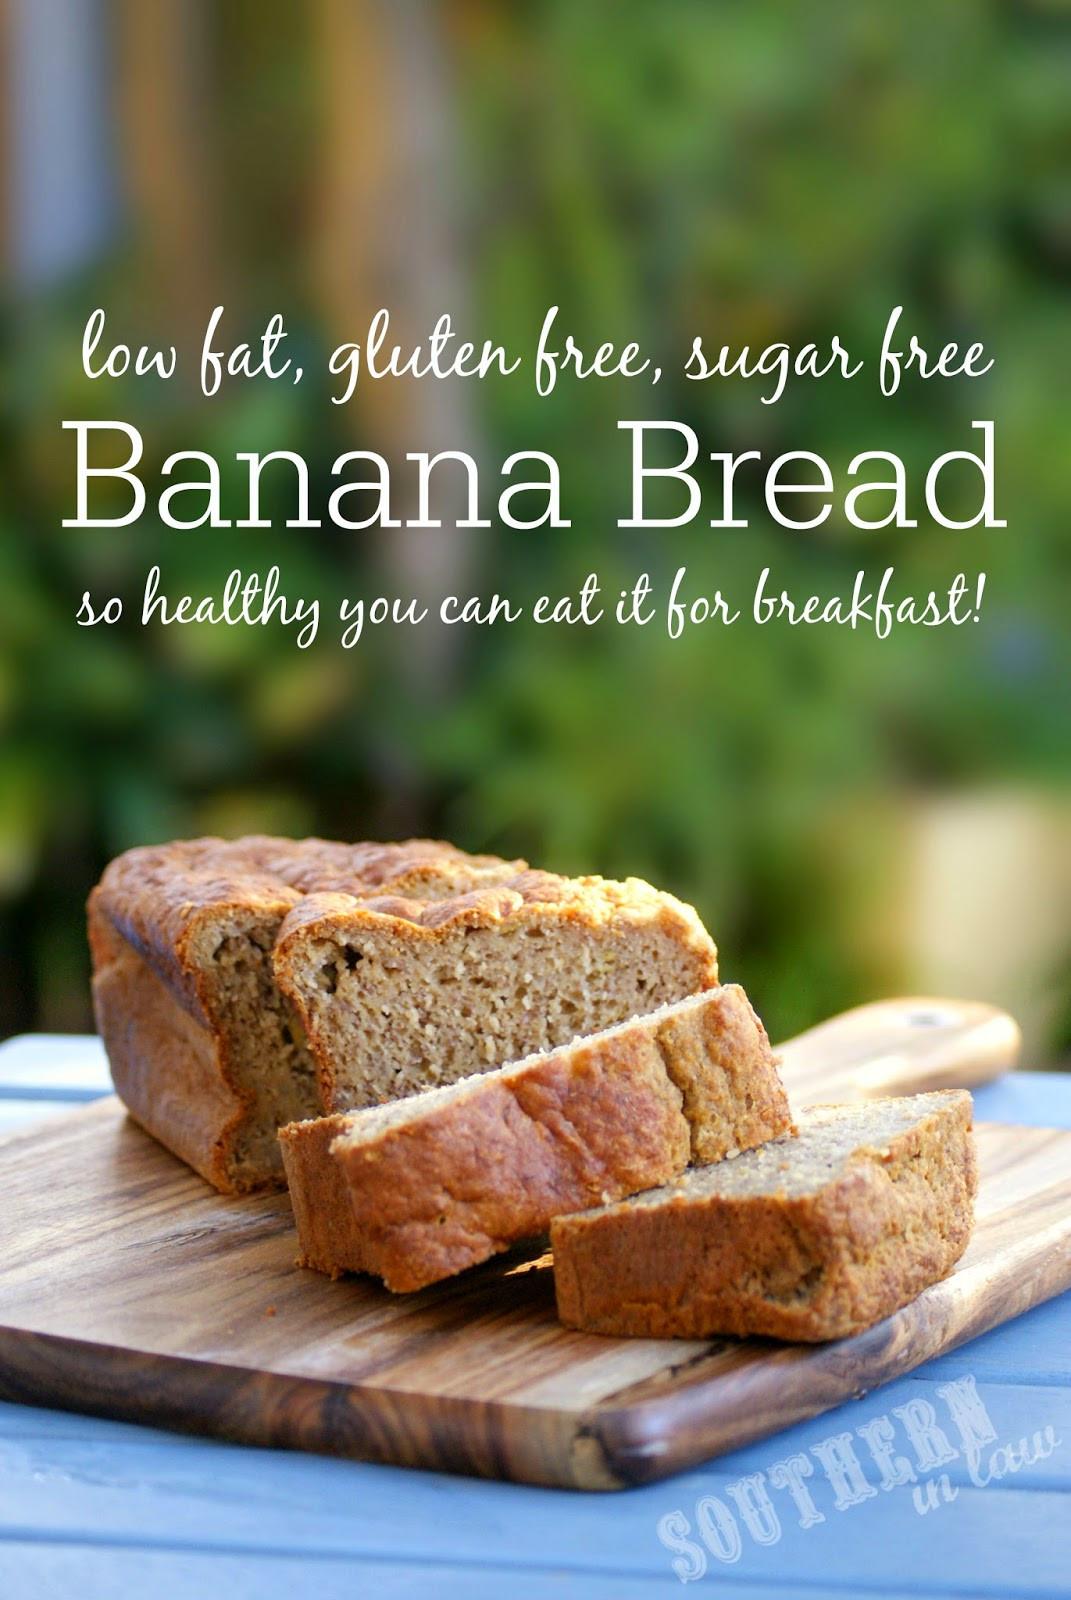 Best Healthy Banana Bread Recipe  Southern In Law Recipe The Best Healthy Banana Bread